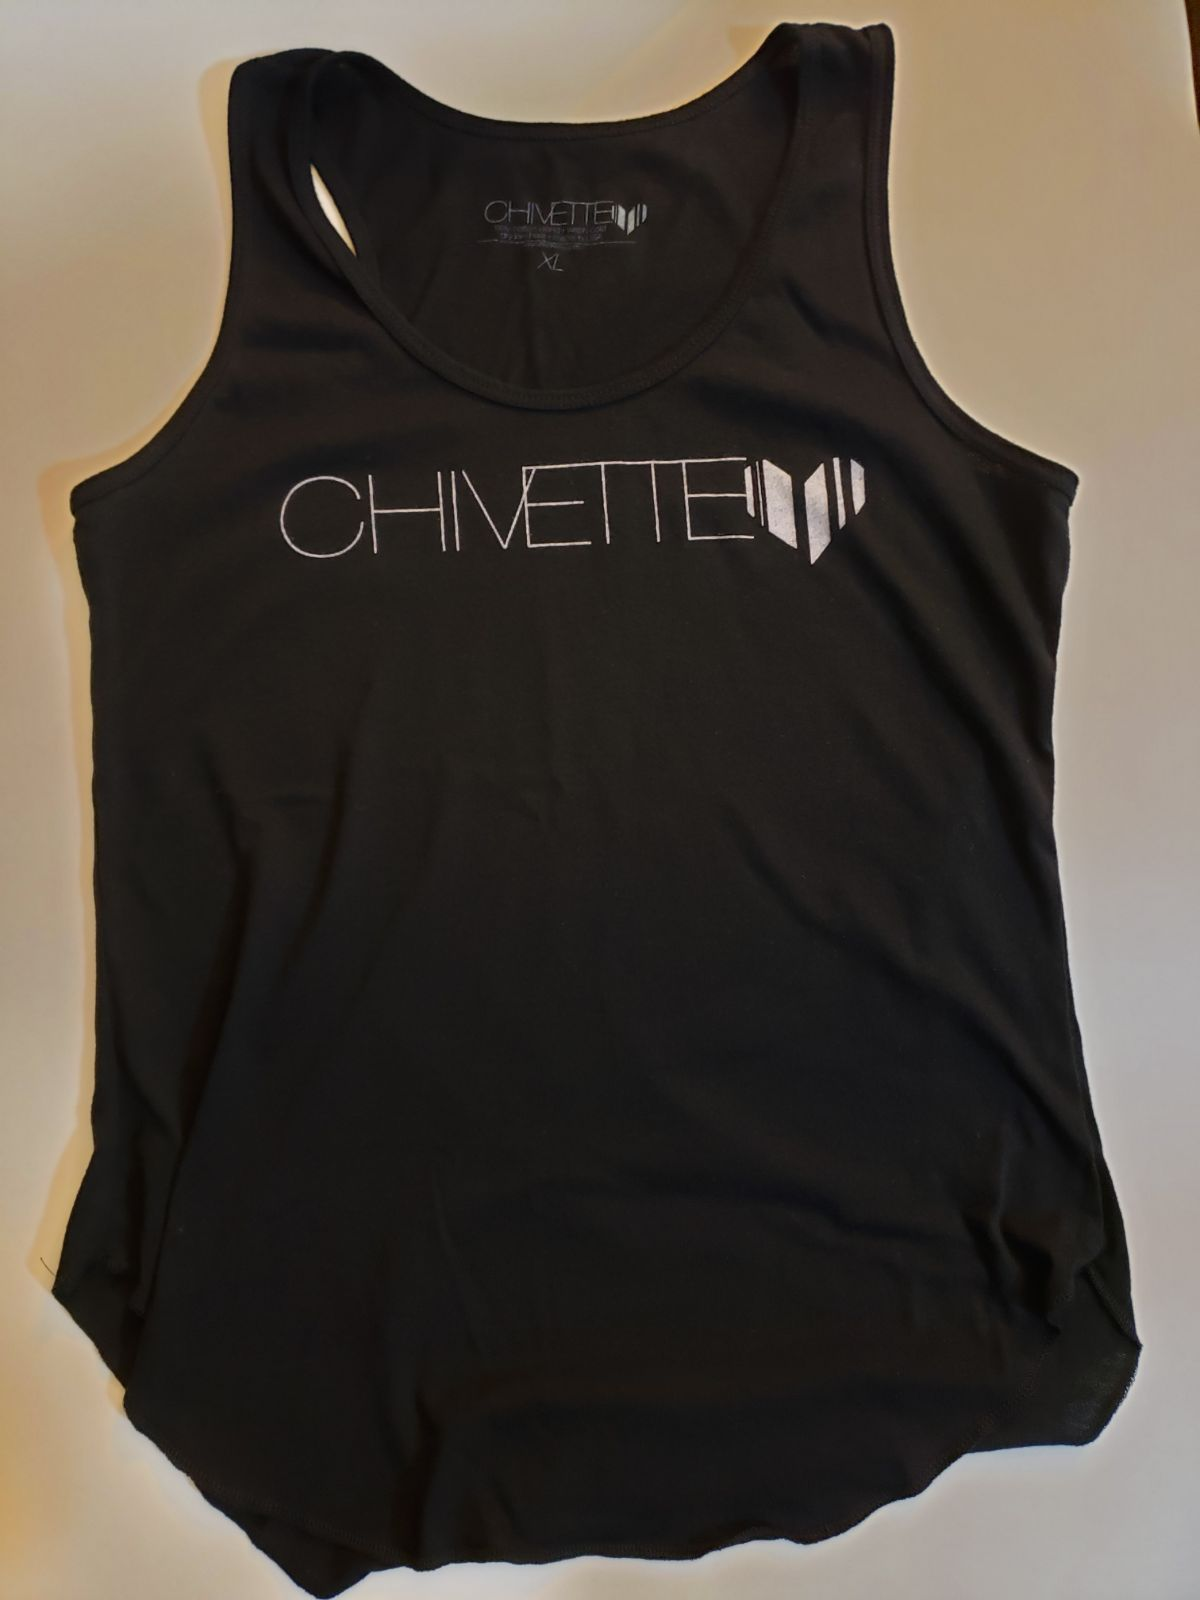 XL Chivette tank top